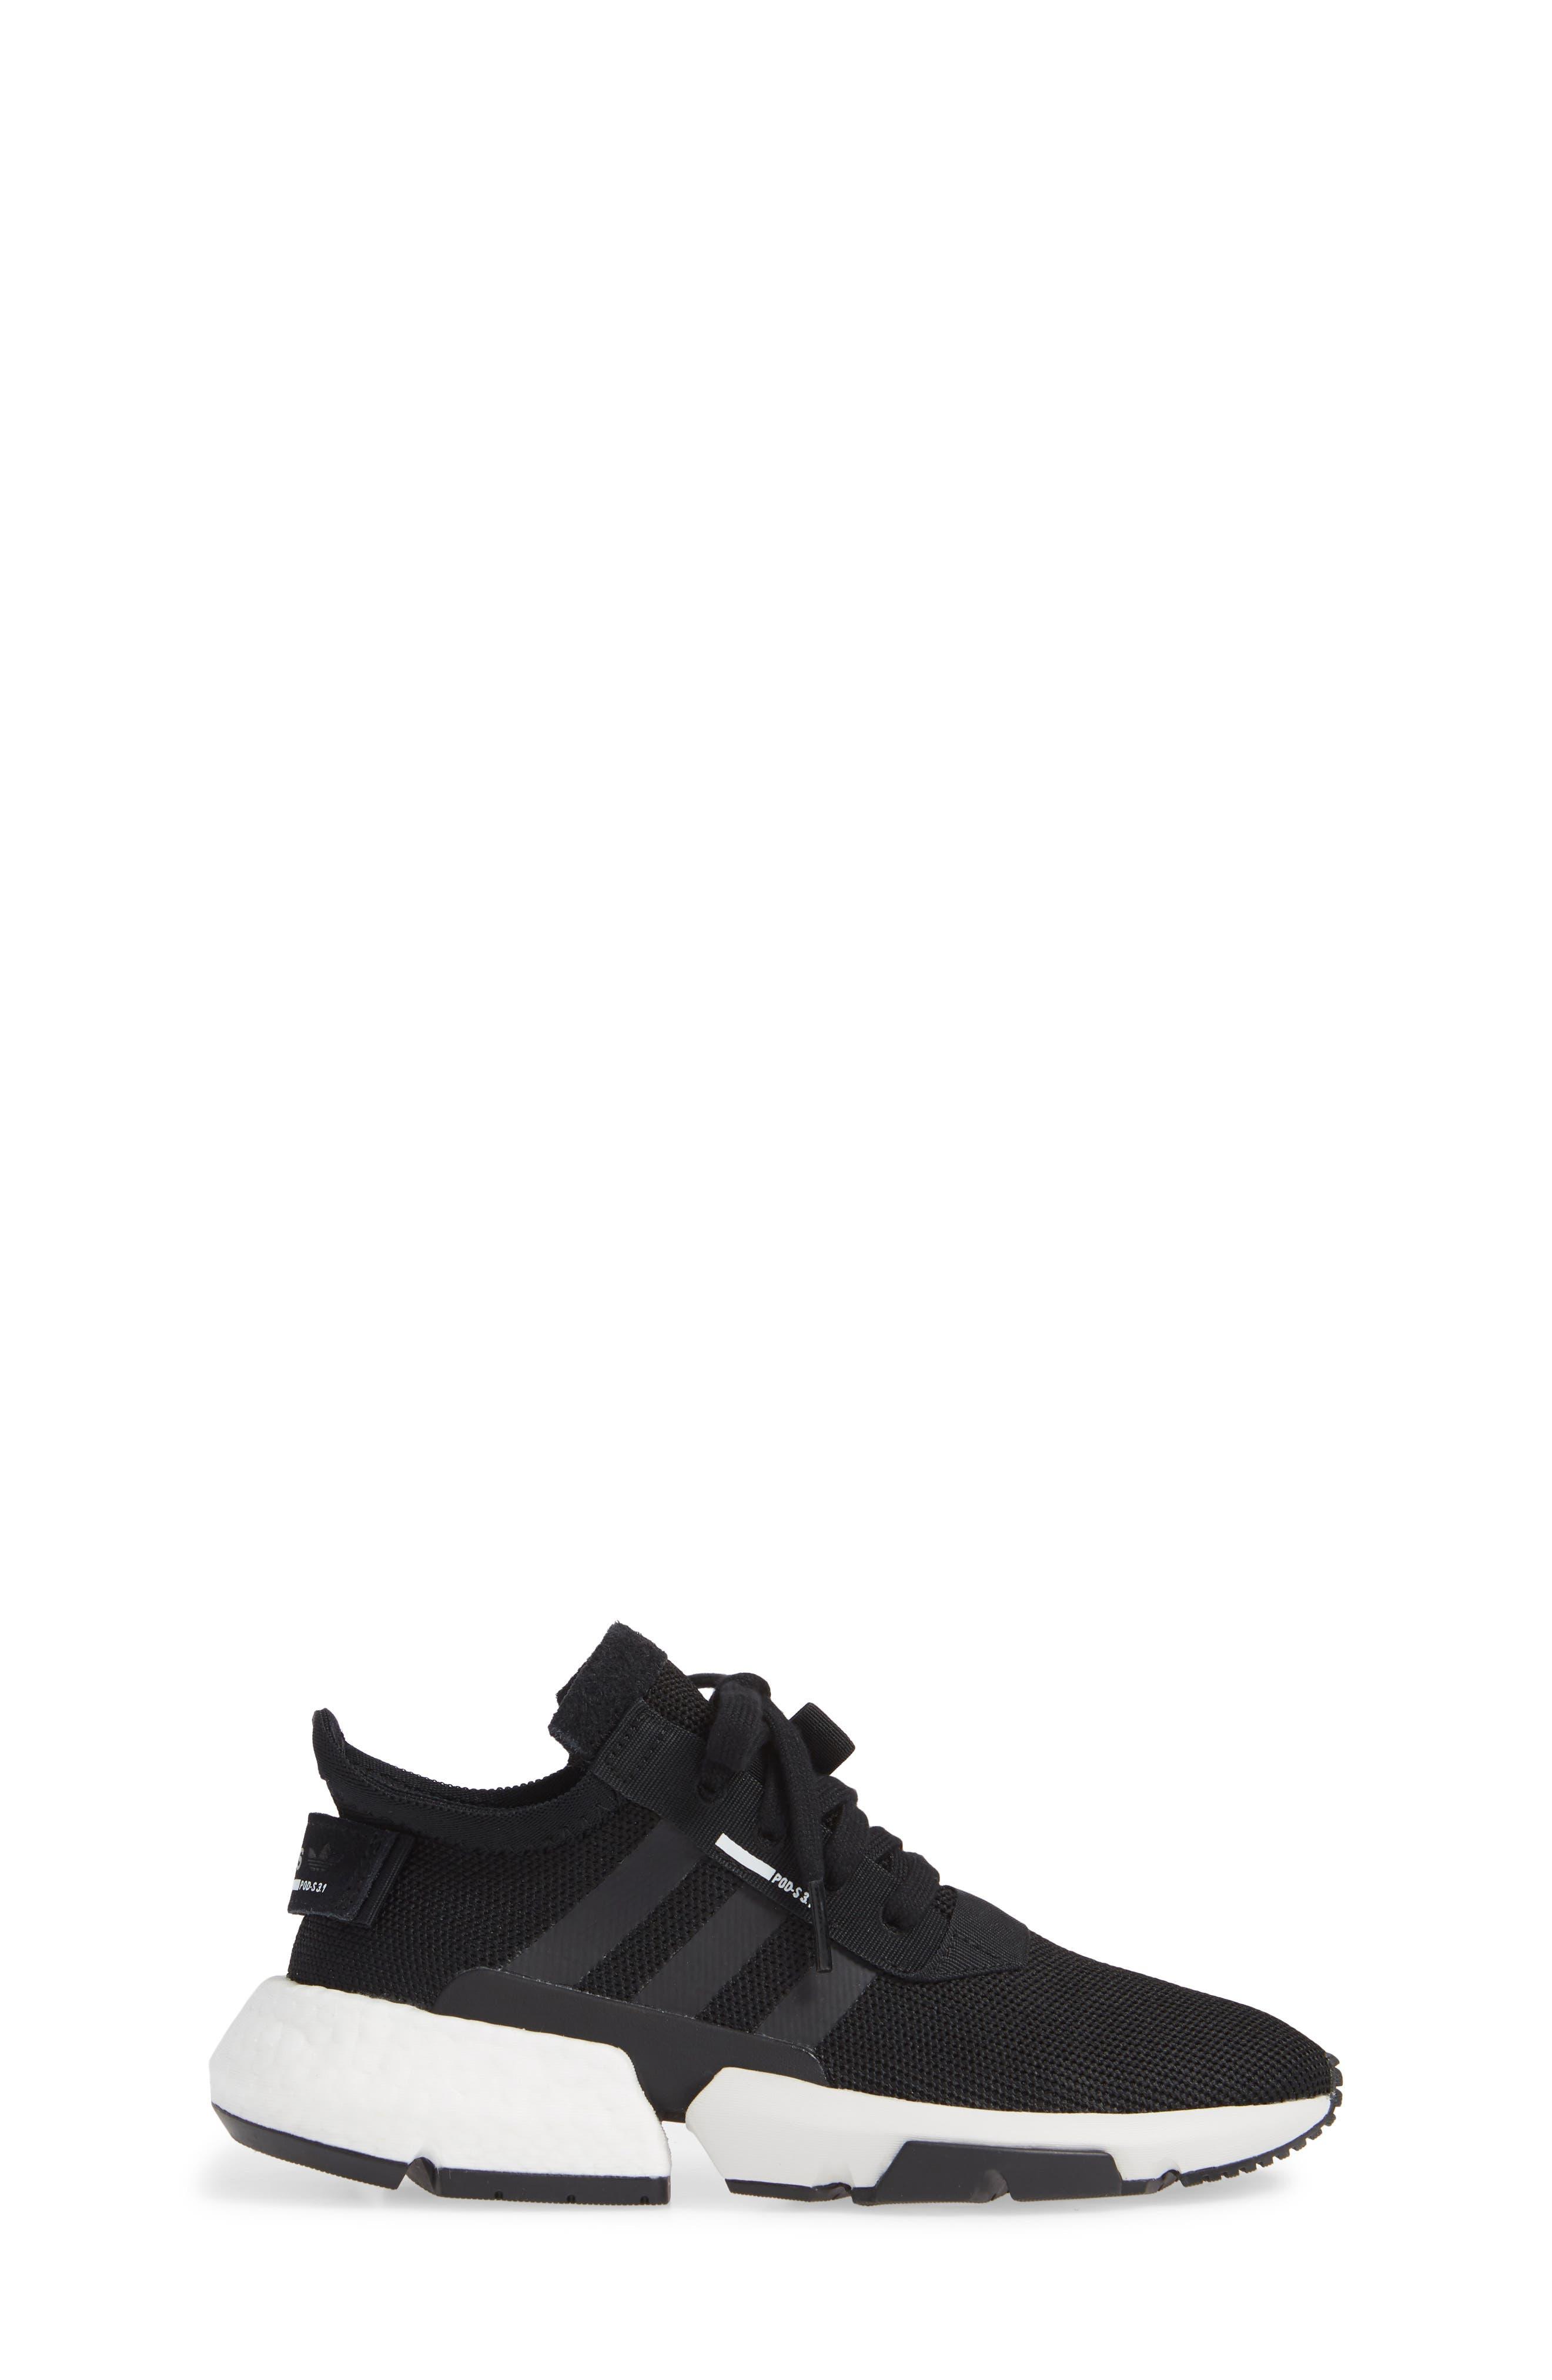 POD-S3.1 Sneaker,                             Alternate thumbnail 3, color,                             CORE BLACK/ BLACK/ LEGEND IVY